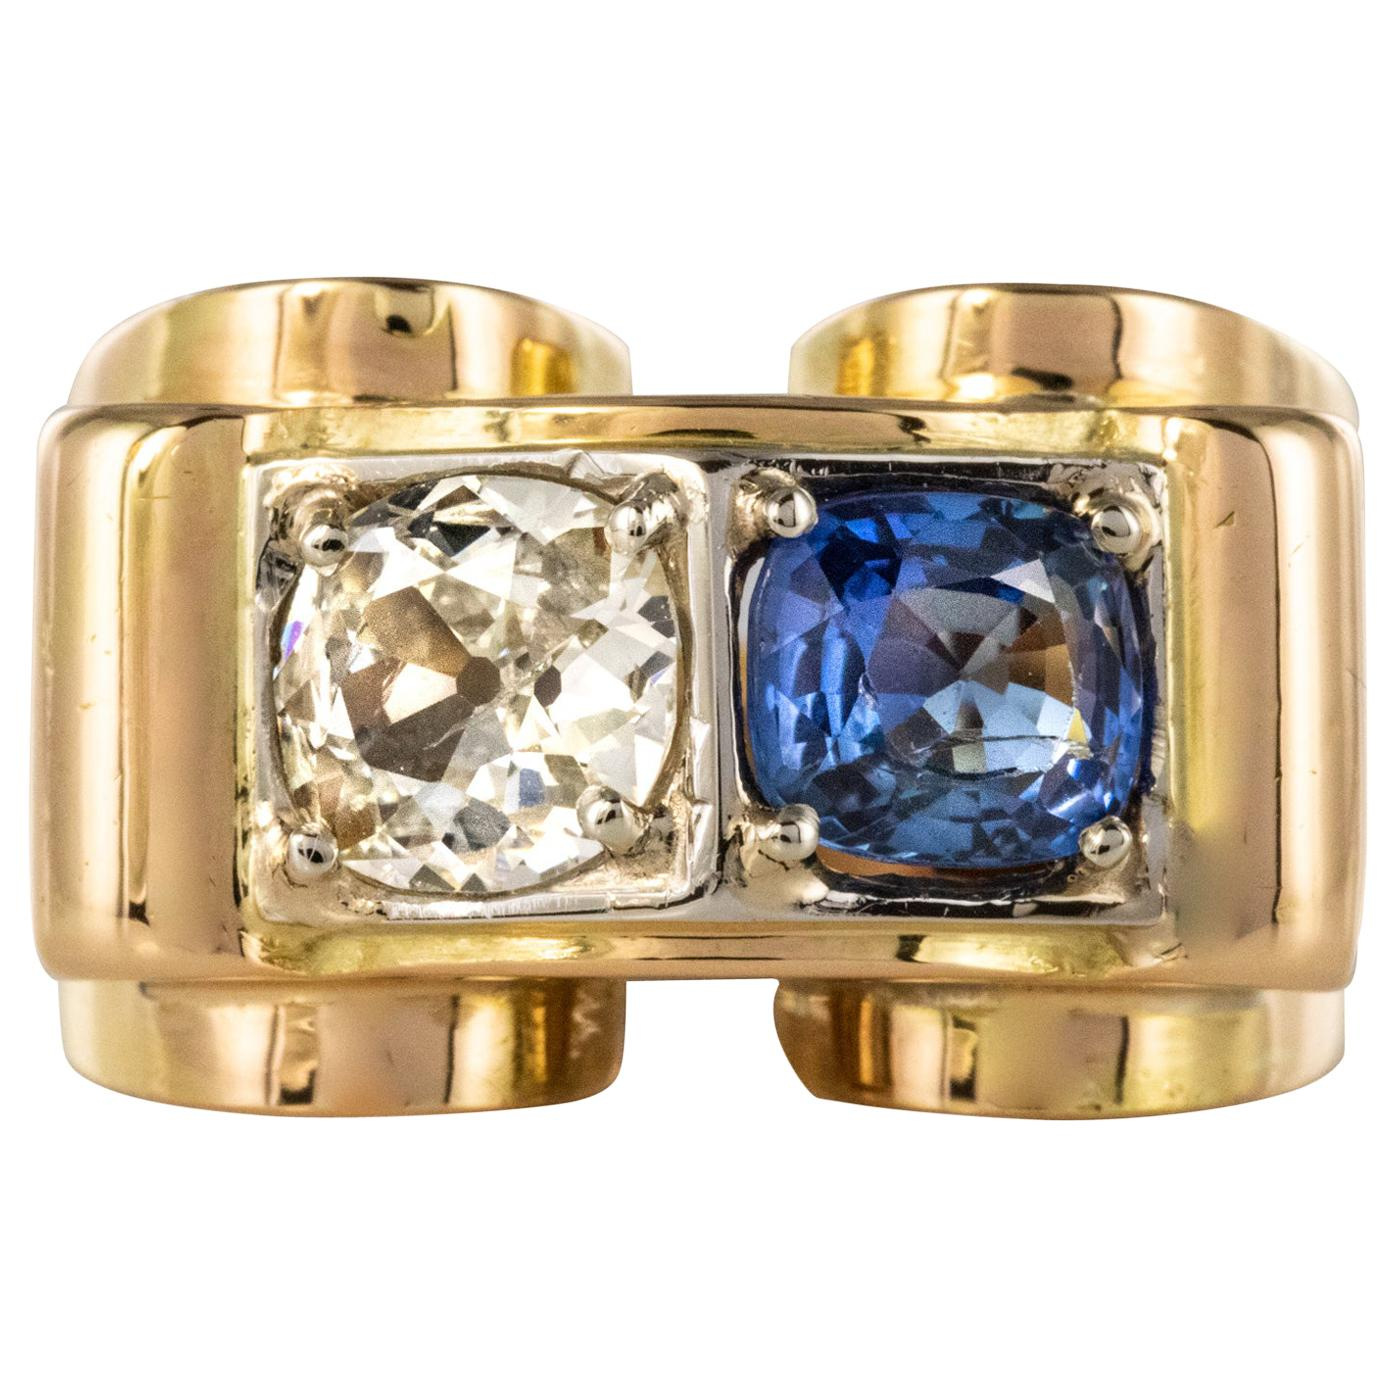 1940s French Sapphire Diamond 18 Karat Yellow Gold Platinum Duo Tank Ring